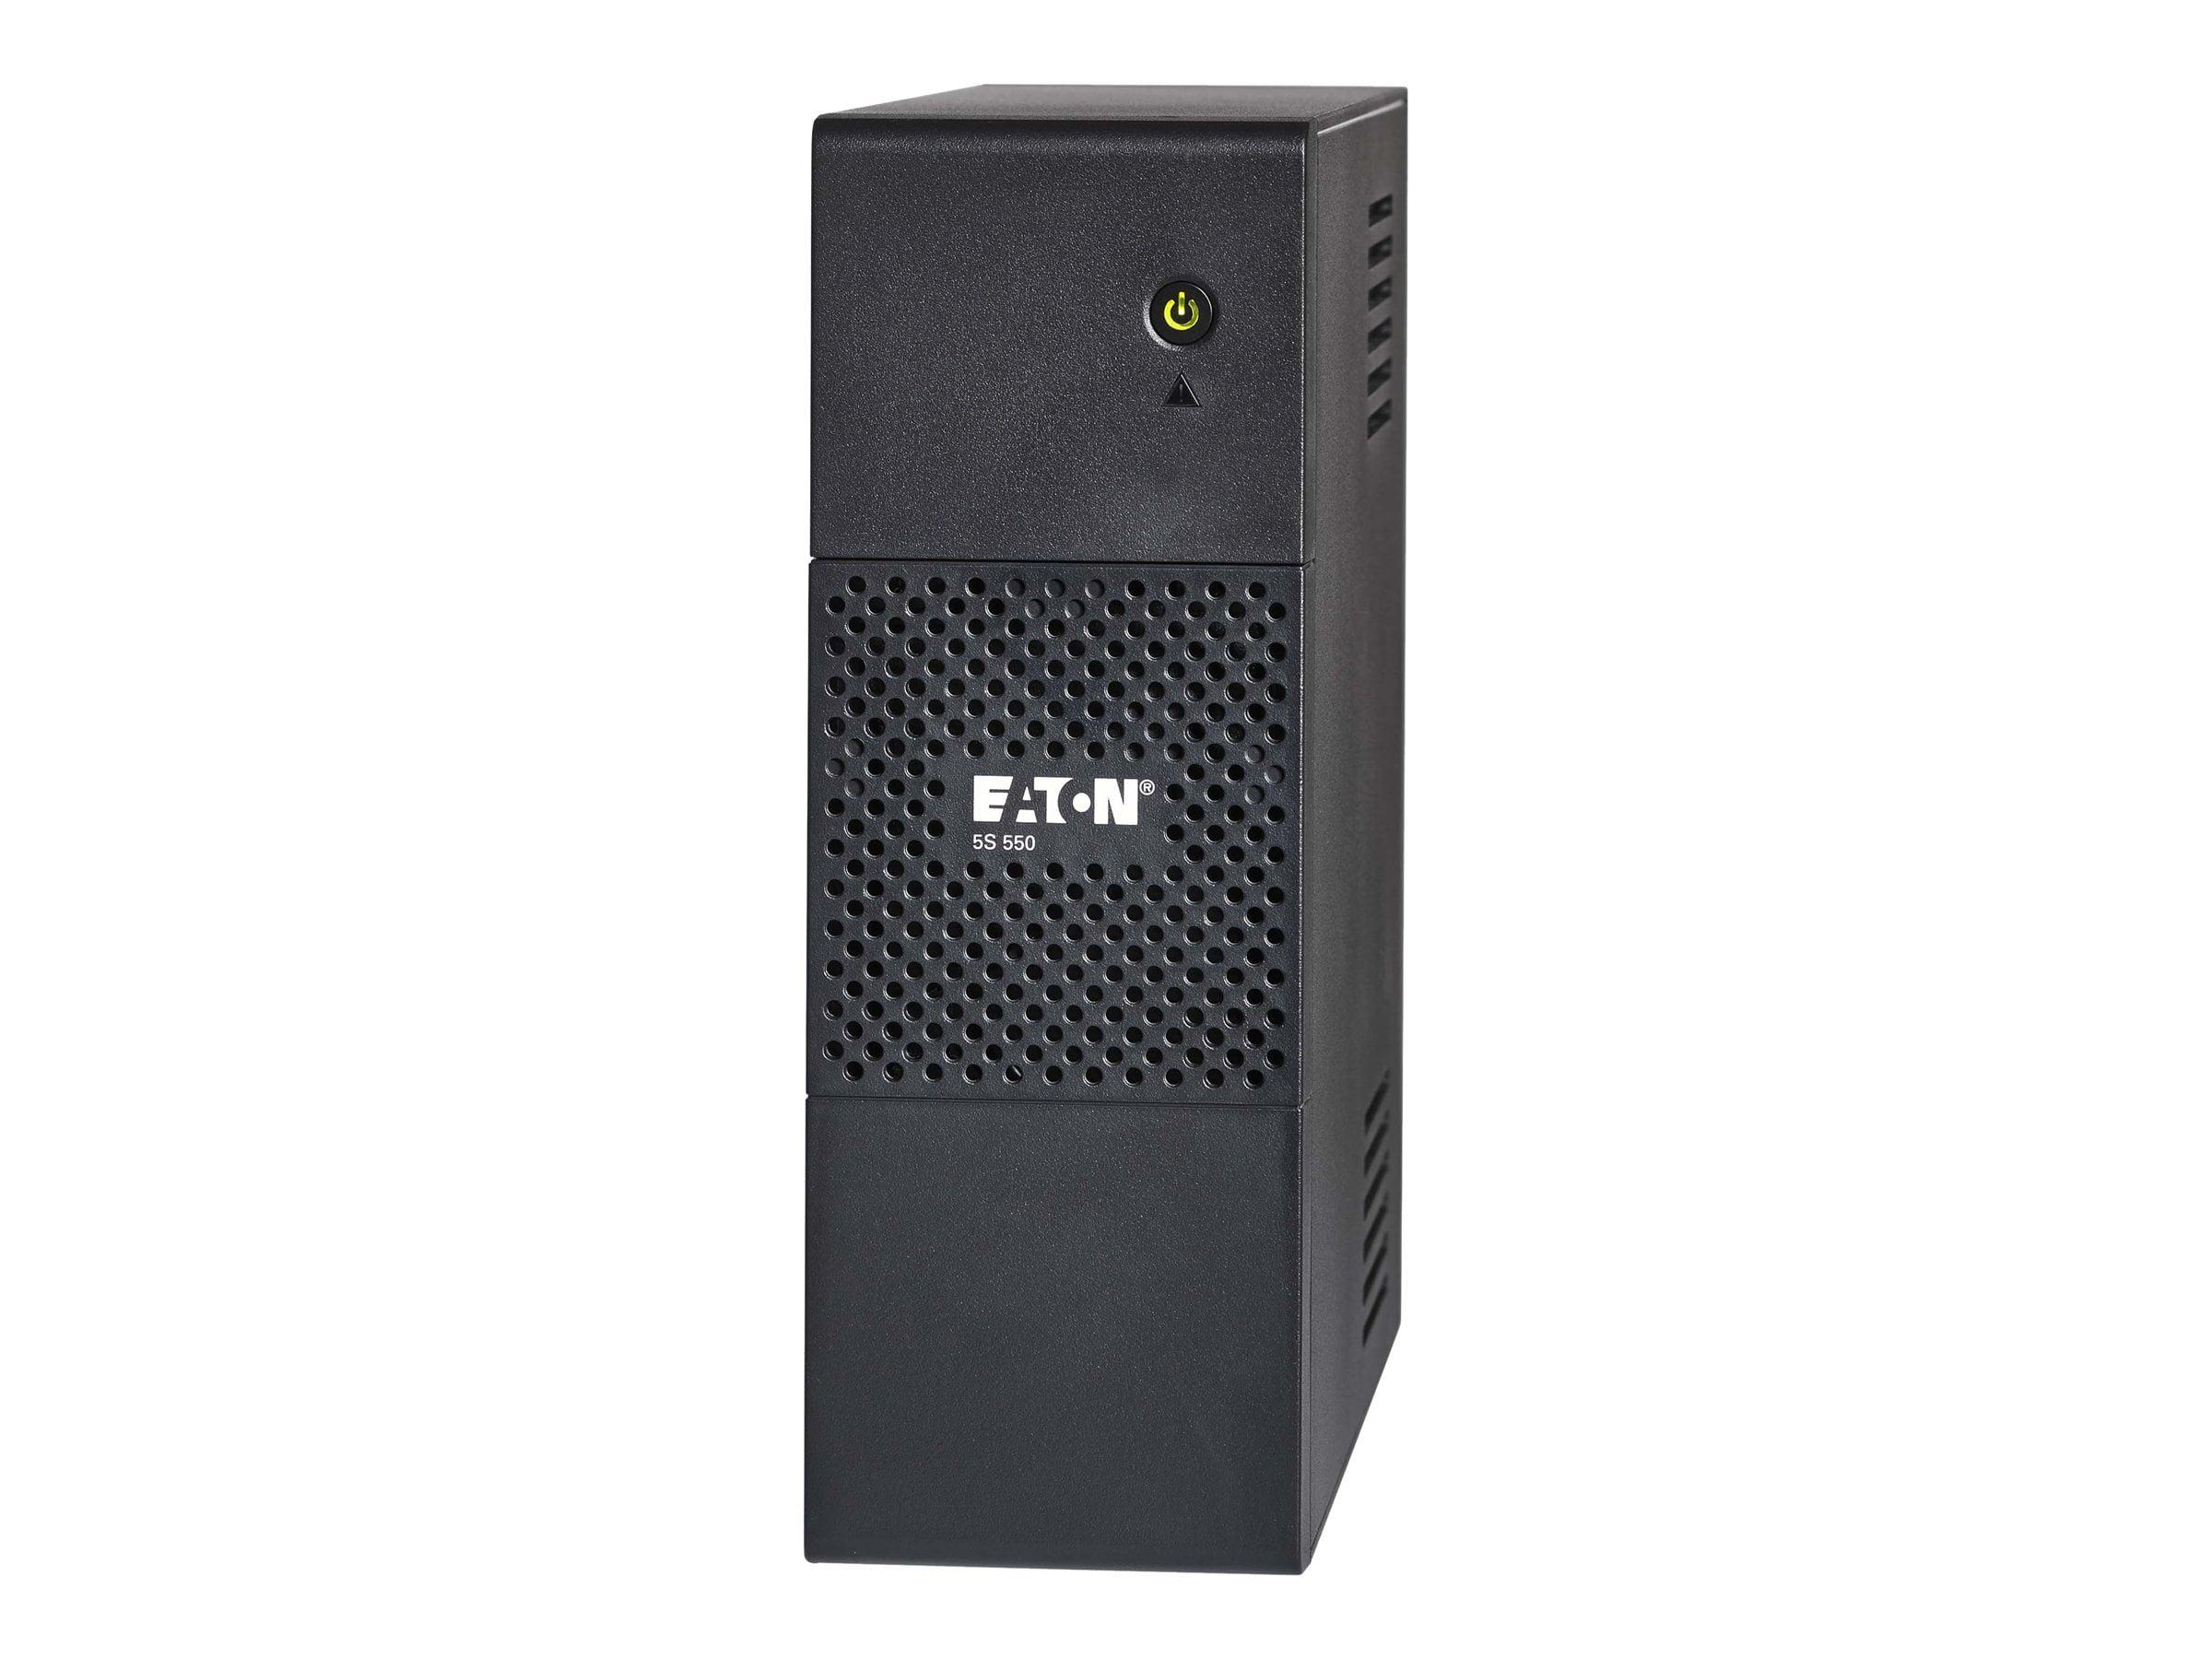 Eaton 5S 1500G - UPS - 900 Watt - 1500 VA